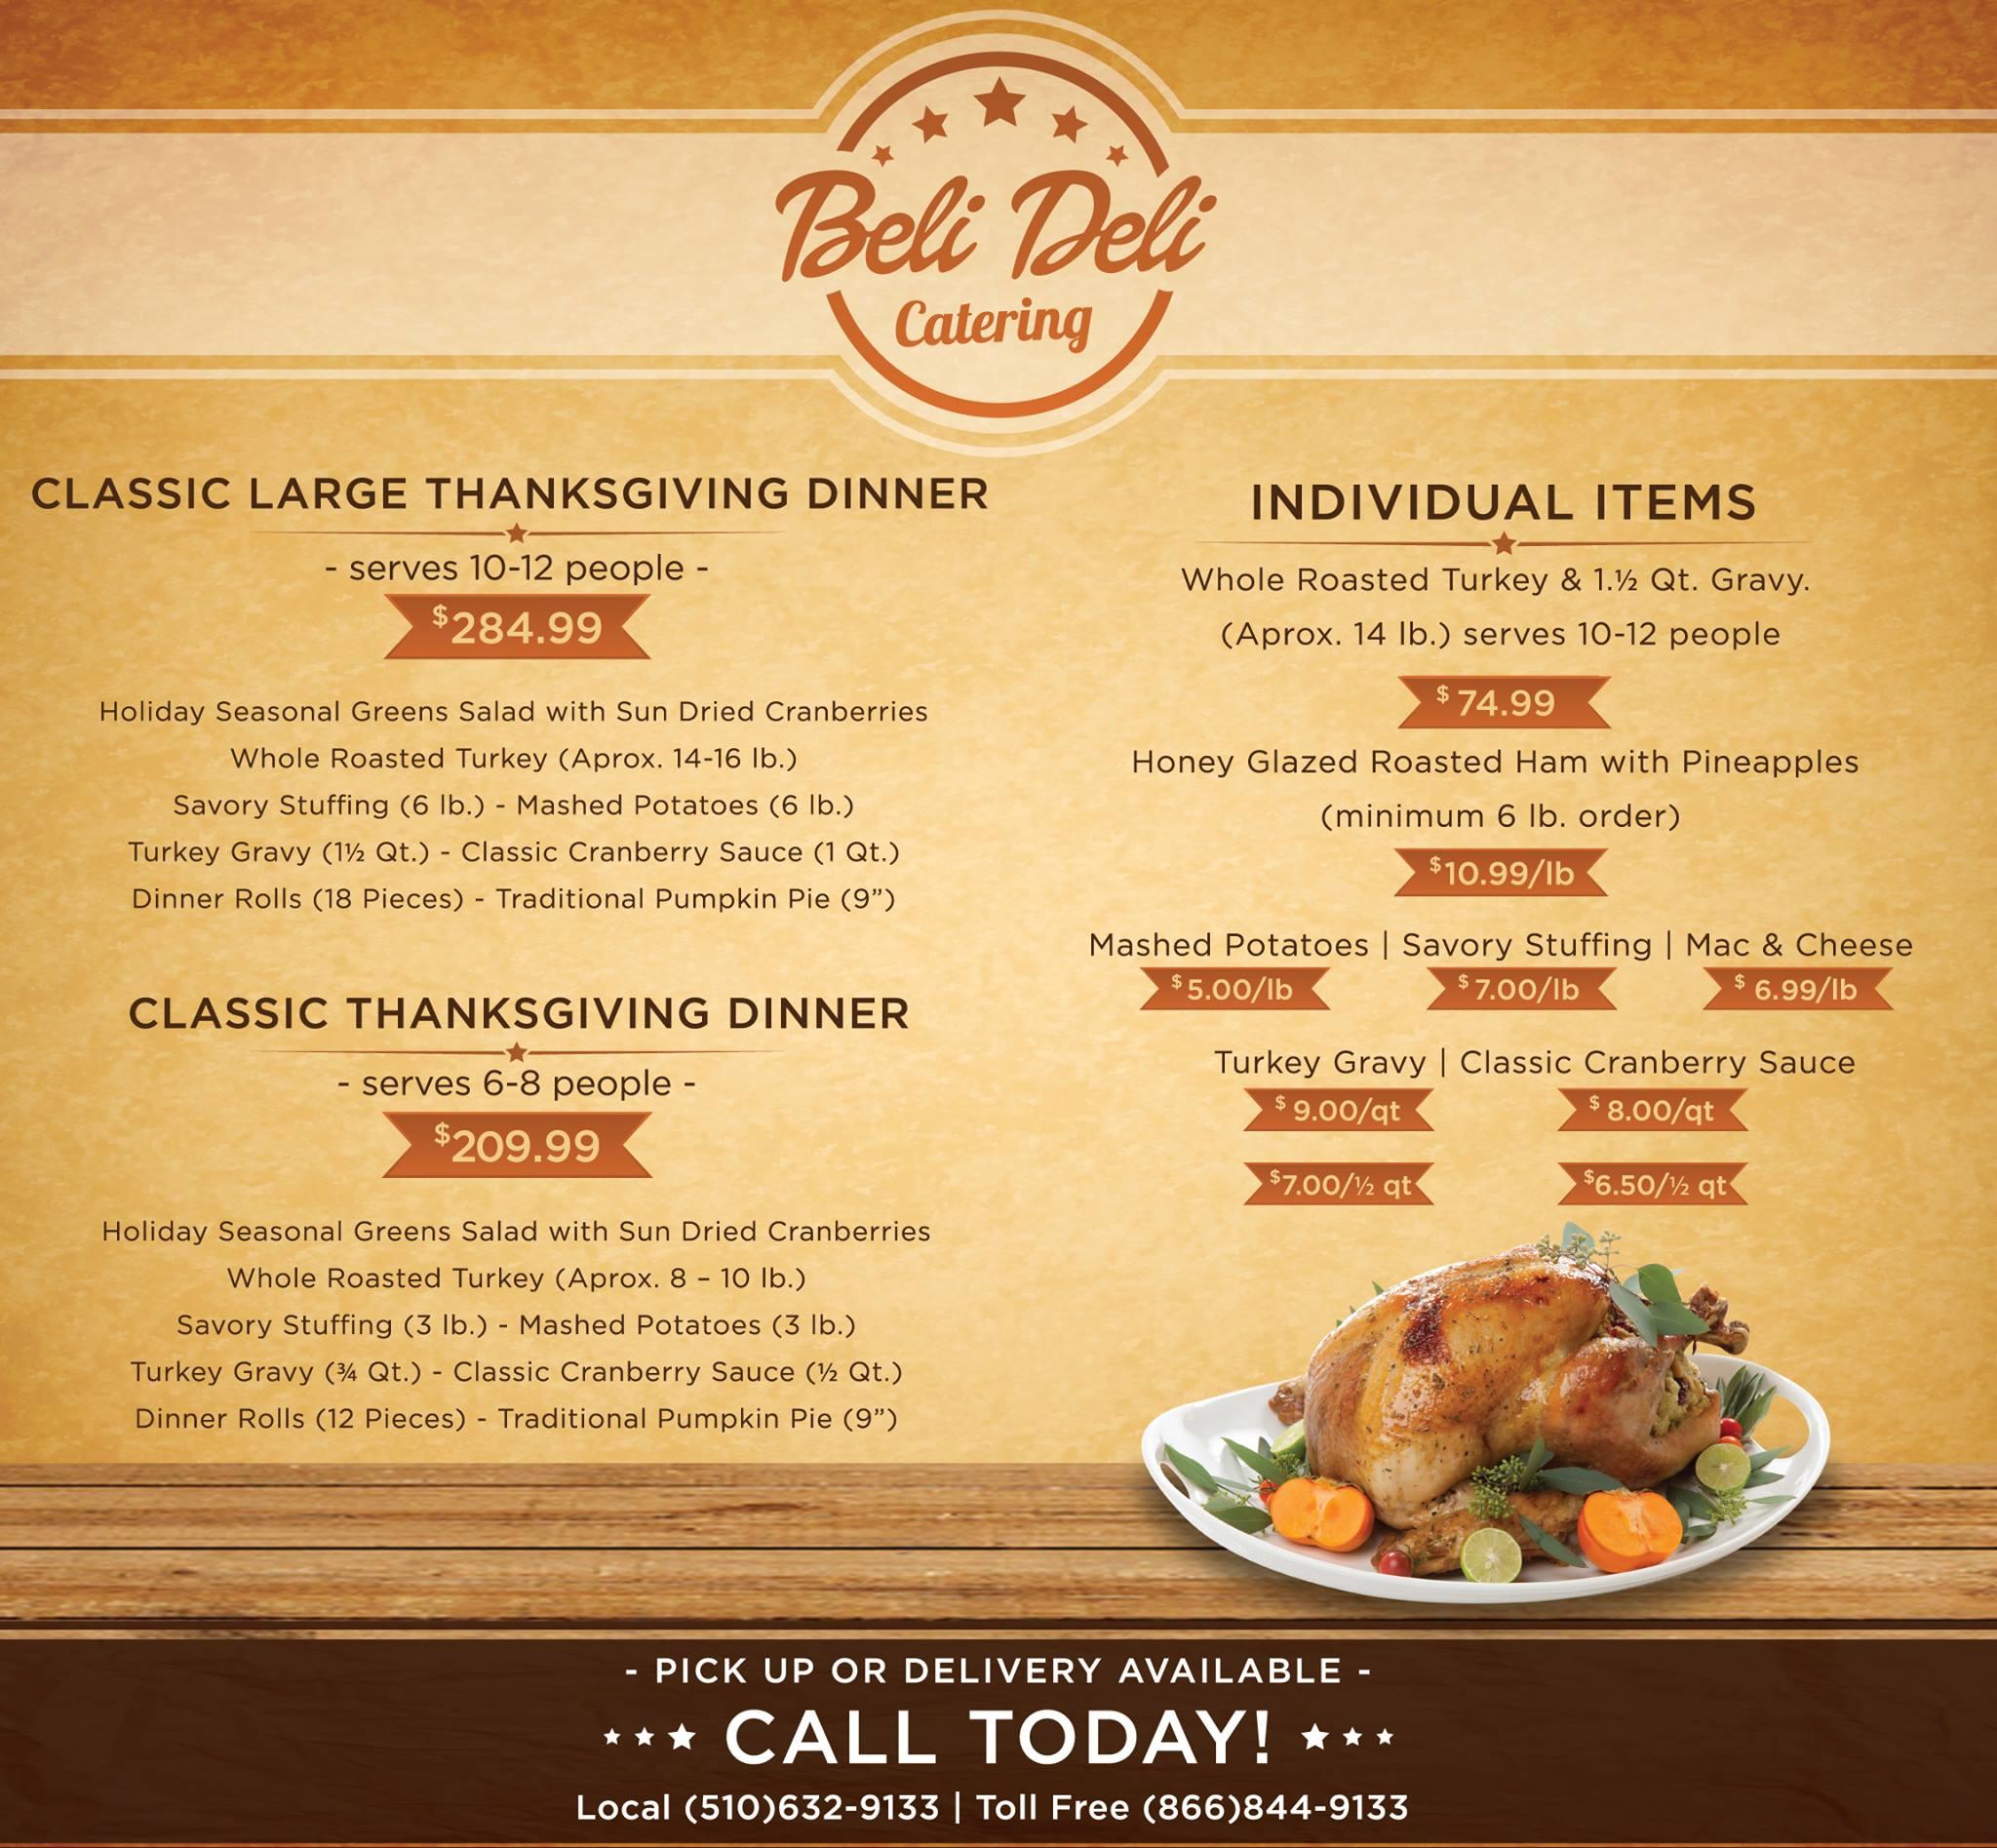 Beli-Deli Gourmet Catering 8105 Edgewater Dr #109, Oakland